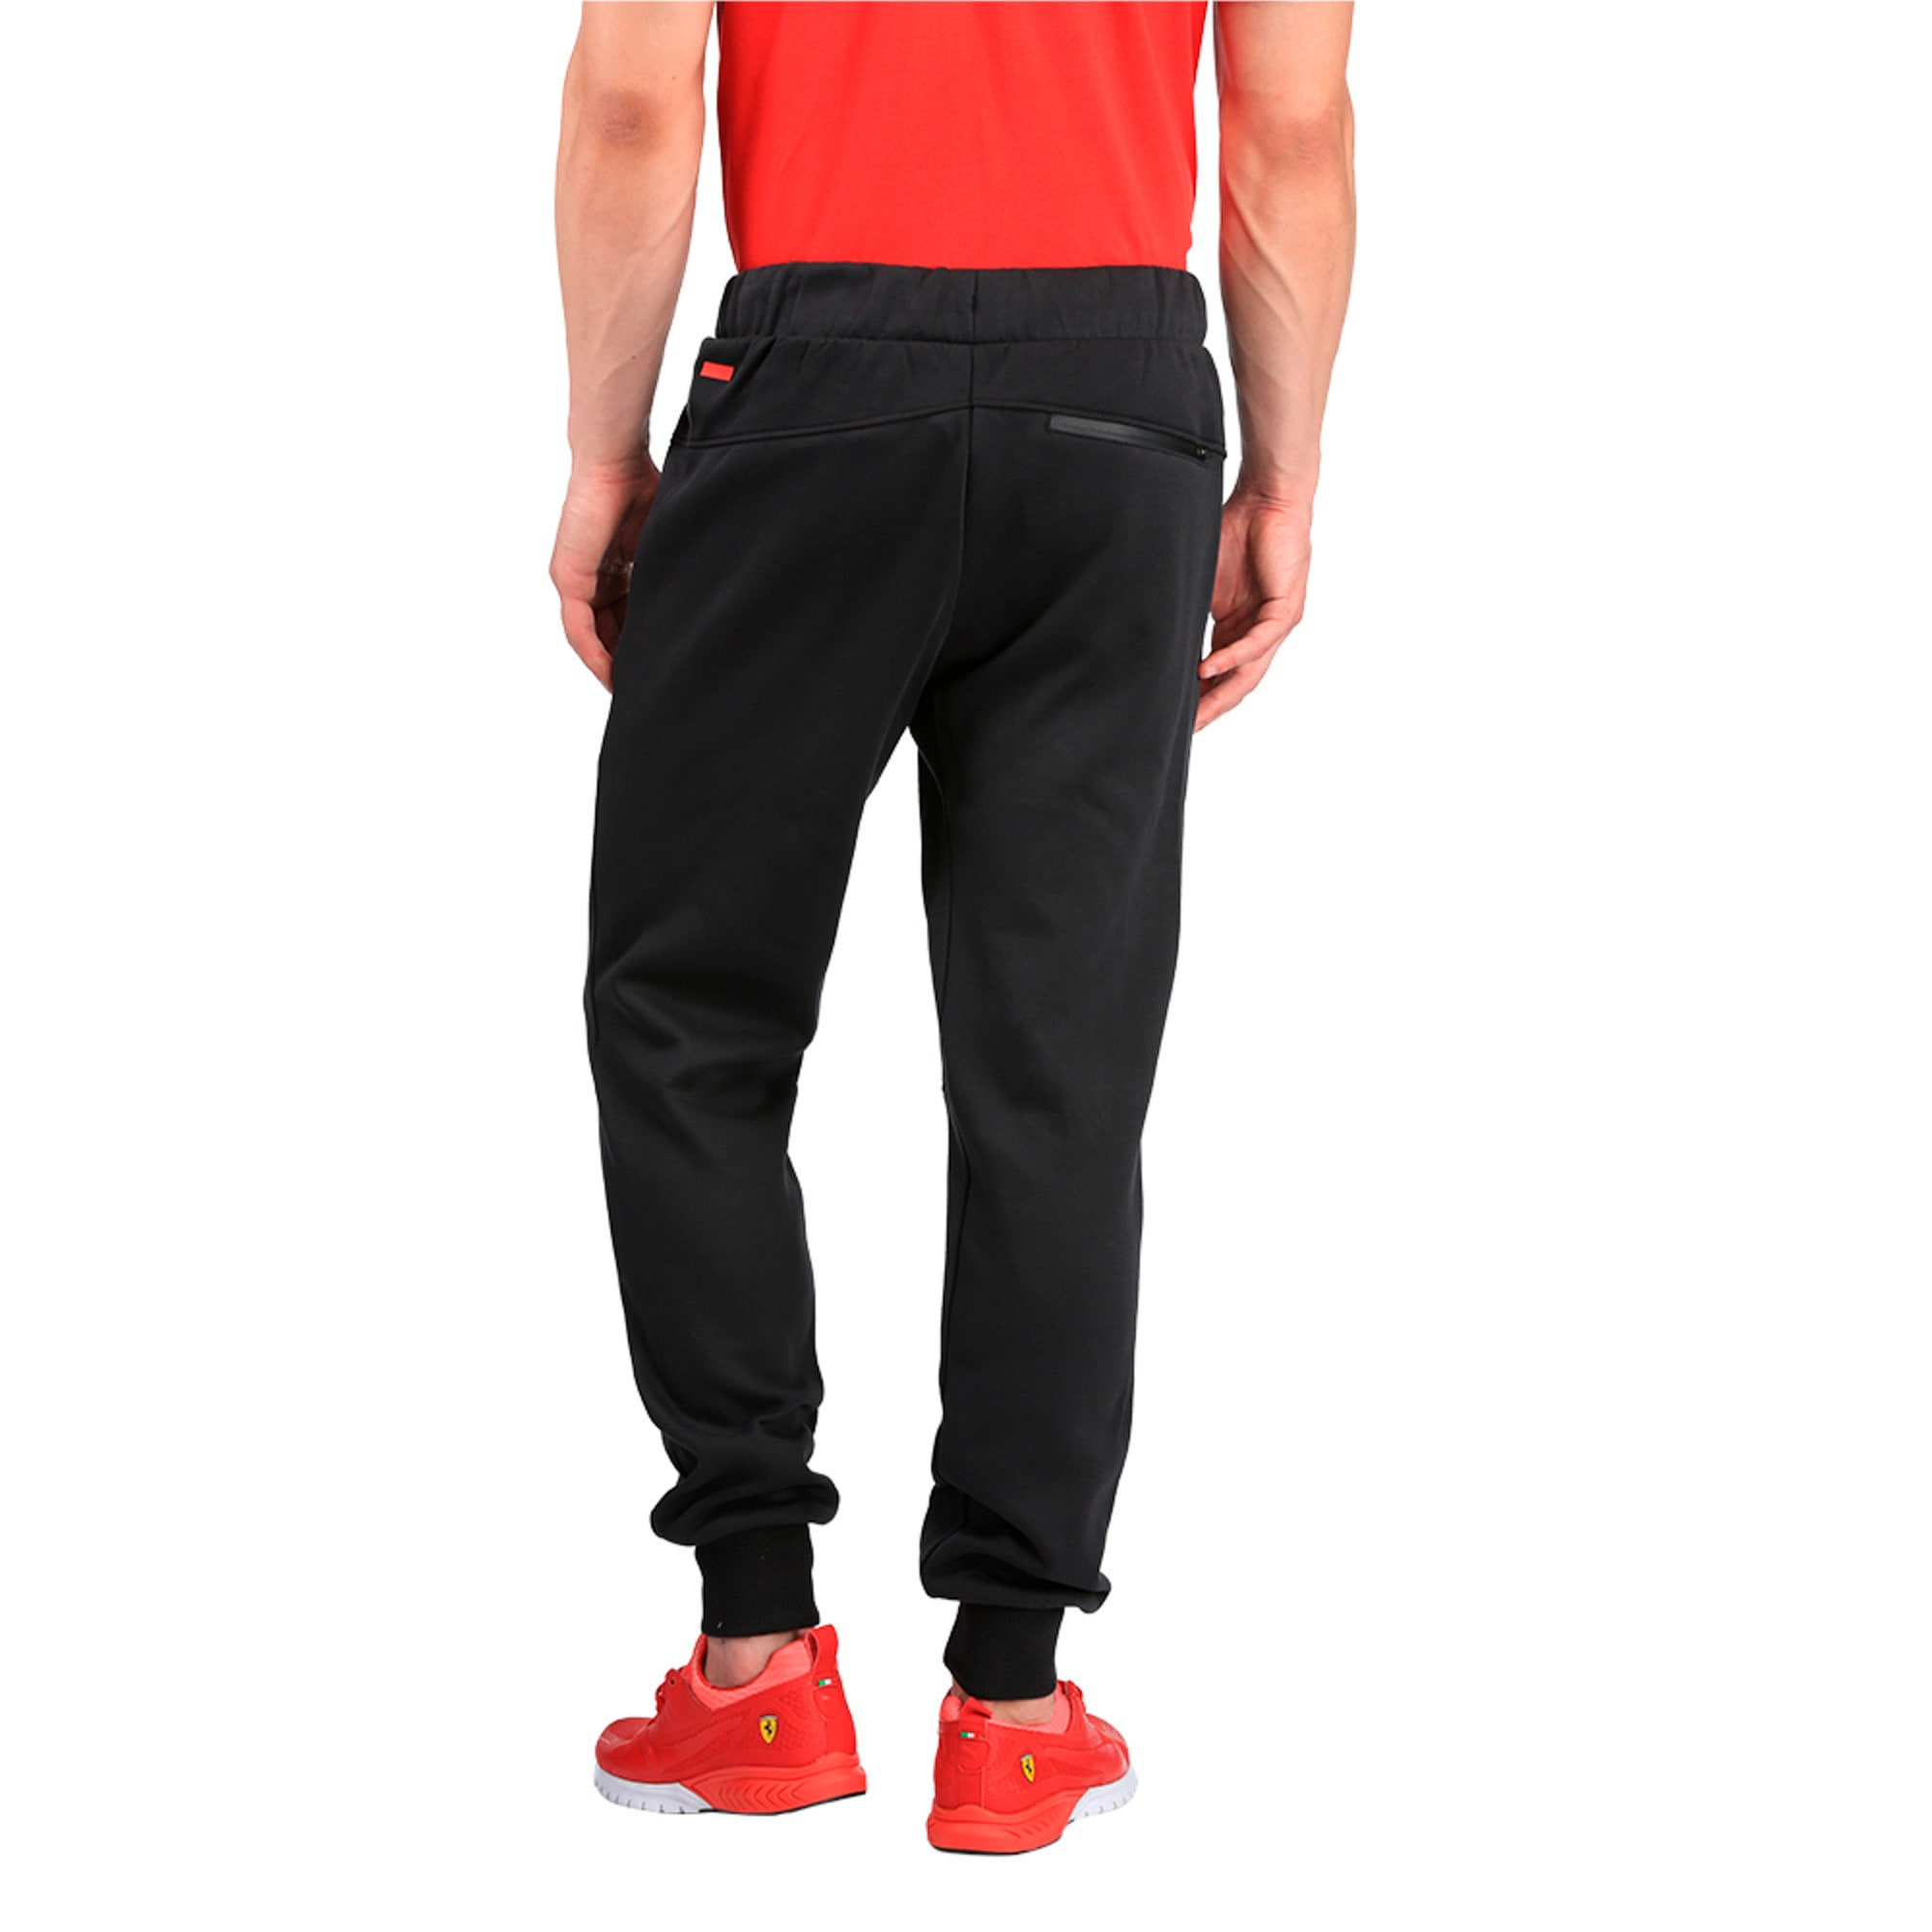 Thumbnail 2 of Ferrari Men's Sweatpants, Moonless Night, medium-IND